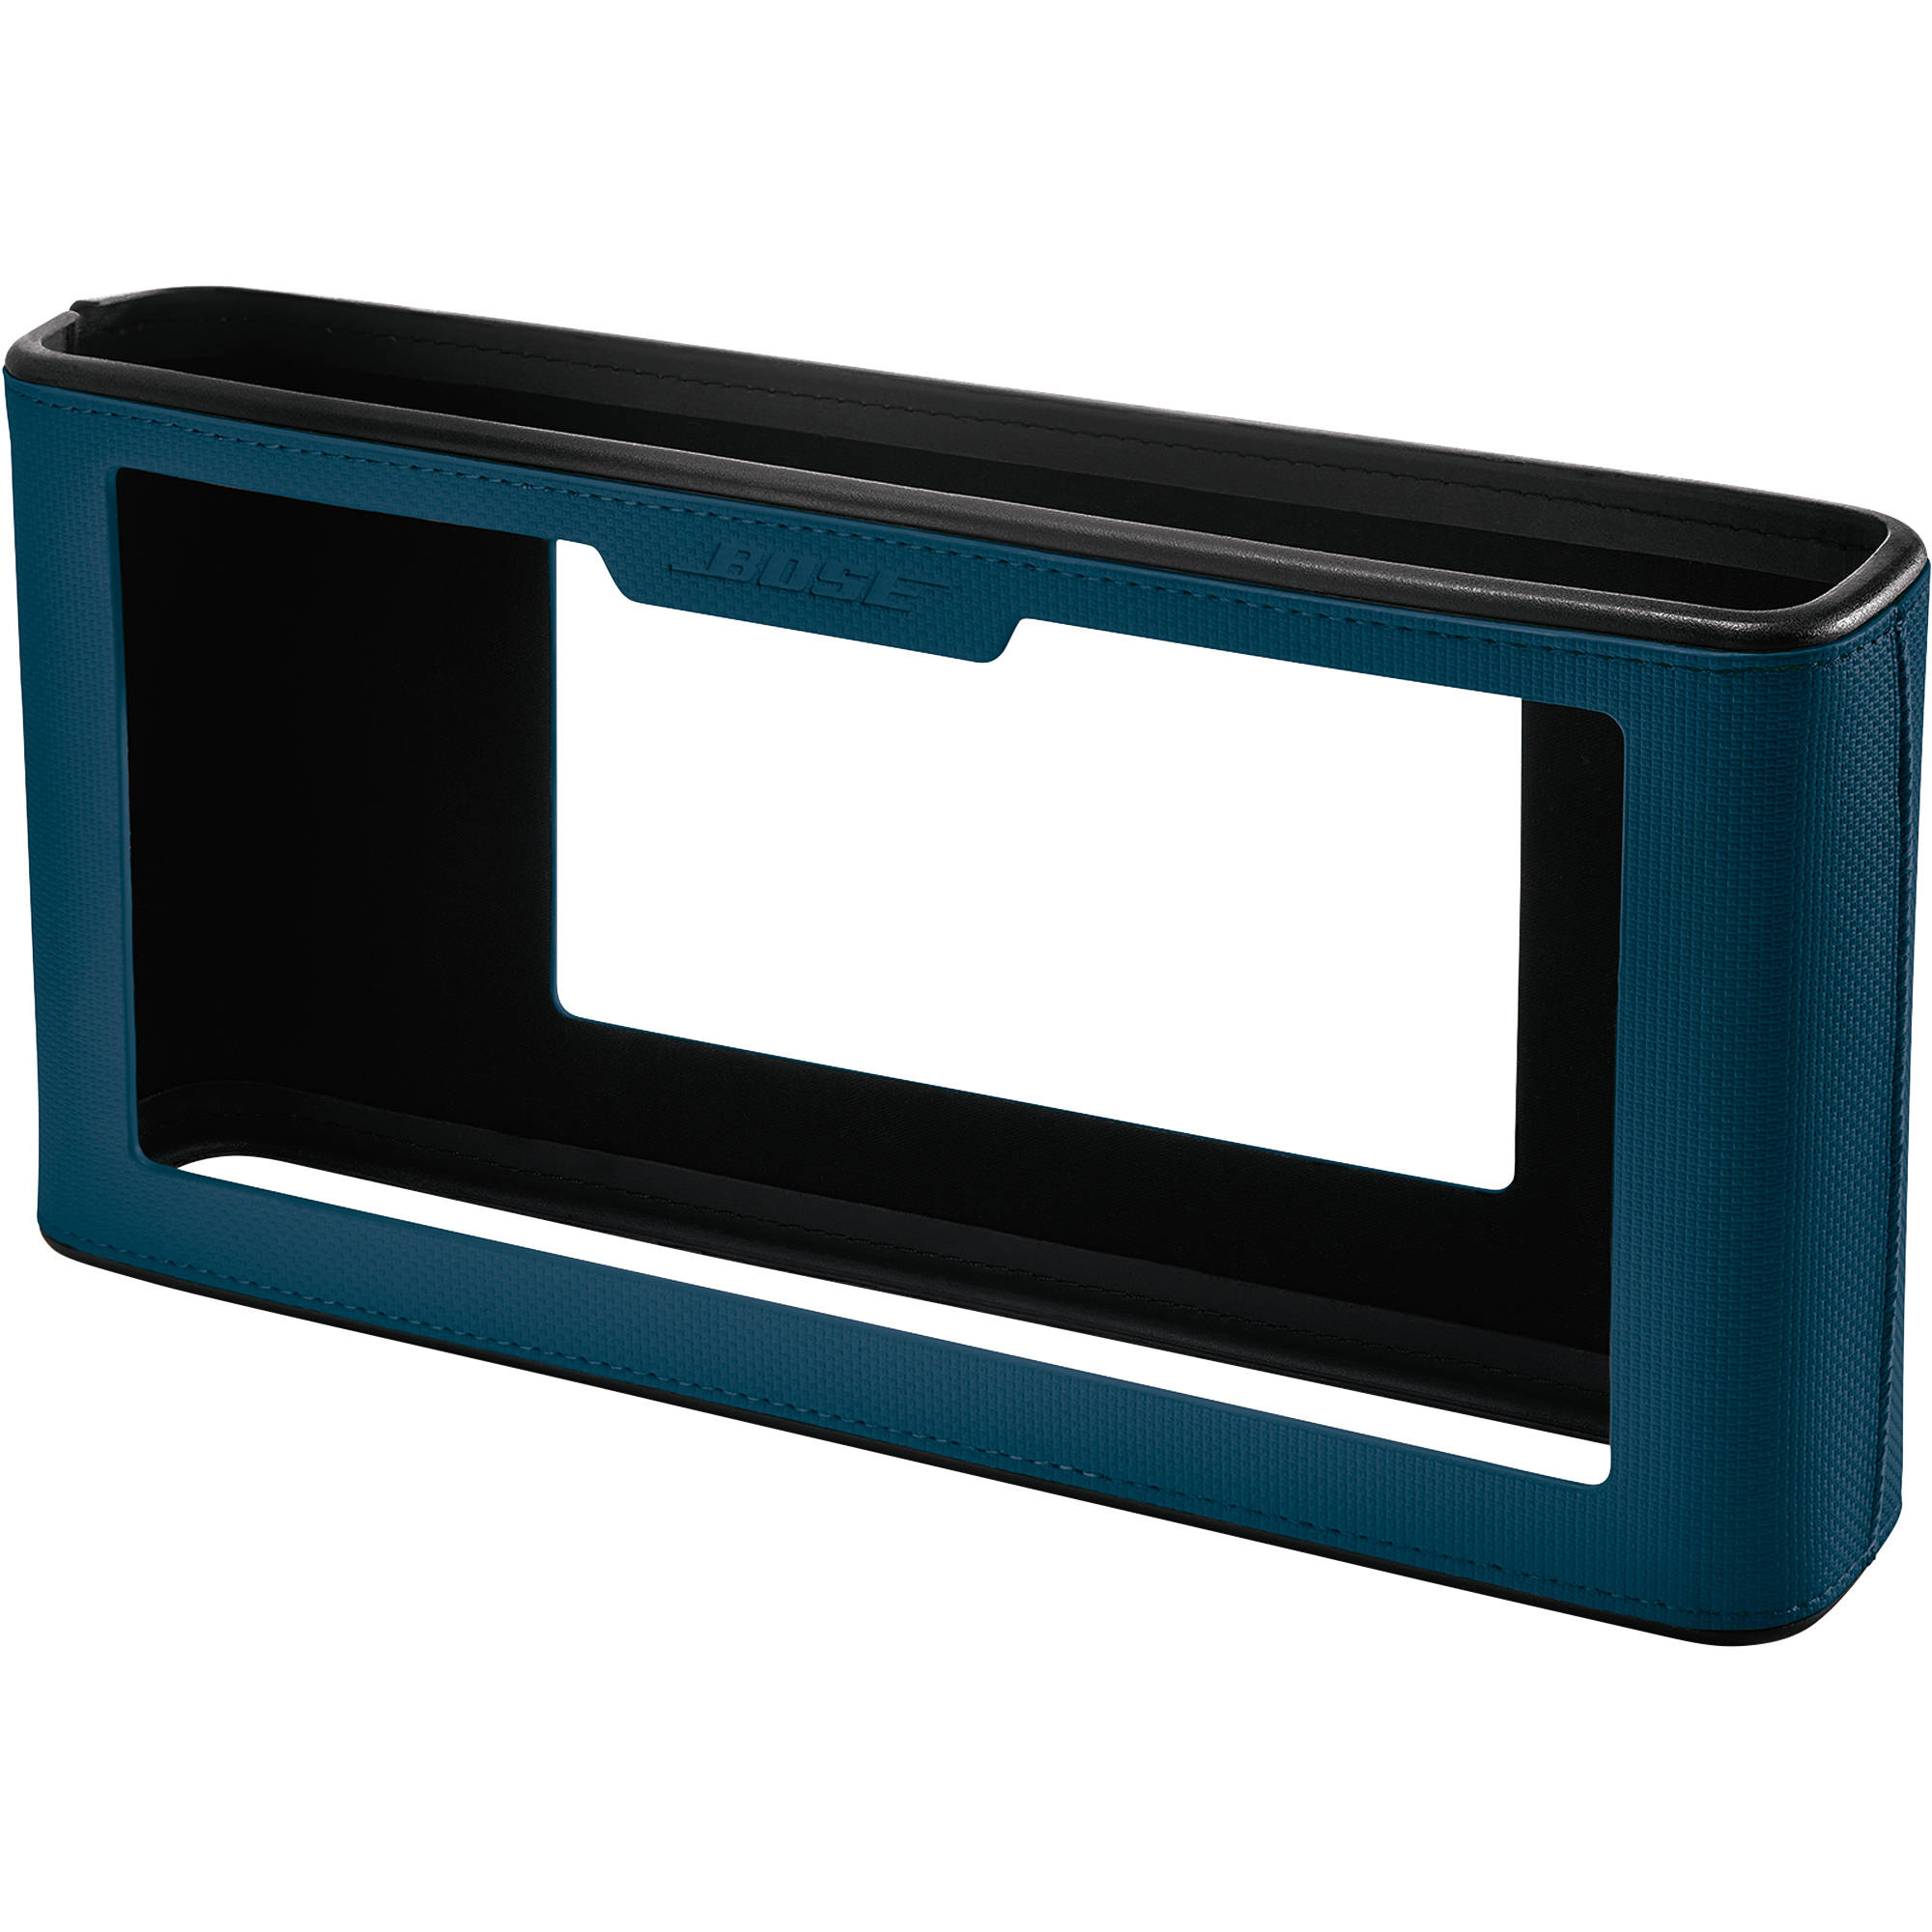 Bose SoundLink Bluetooth Speaker III Cover 628173-0070 B&H Photo